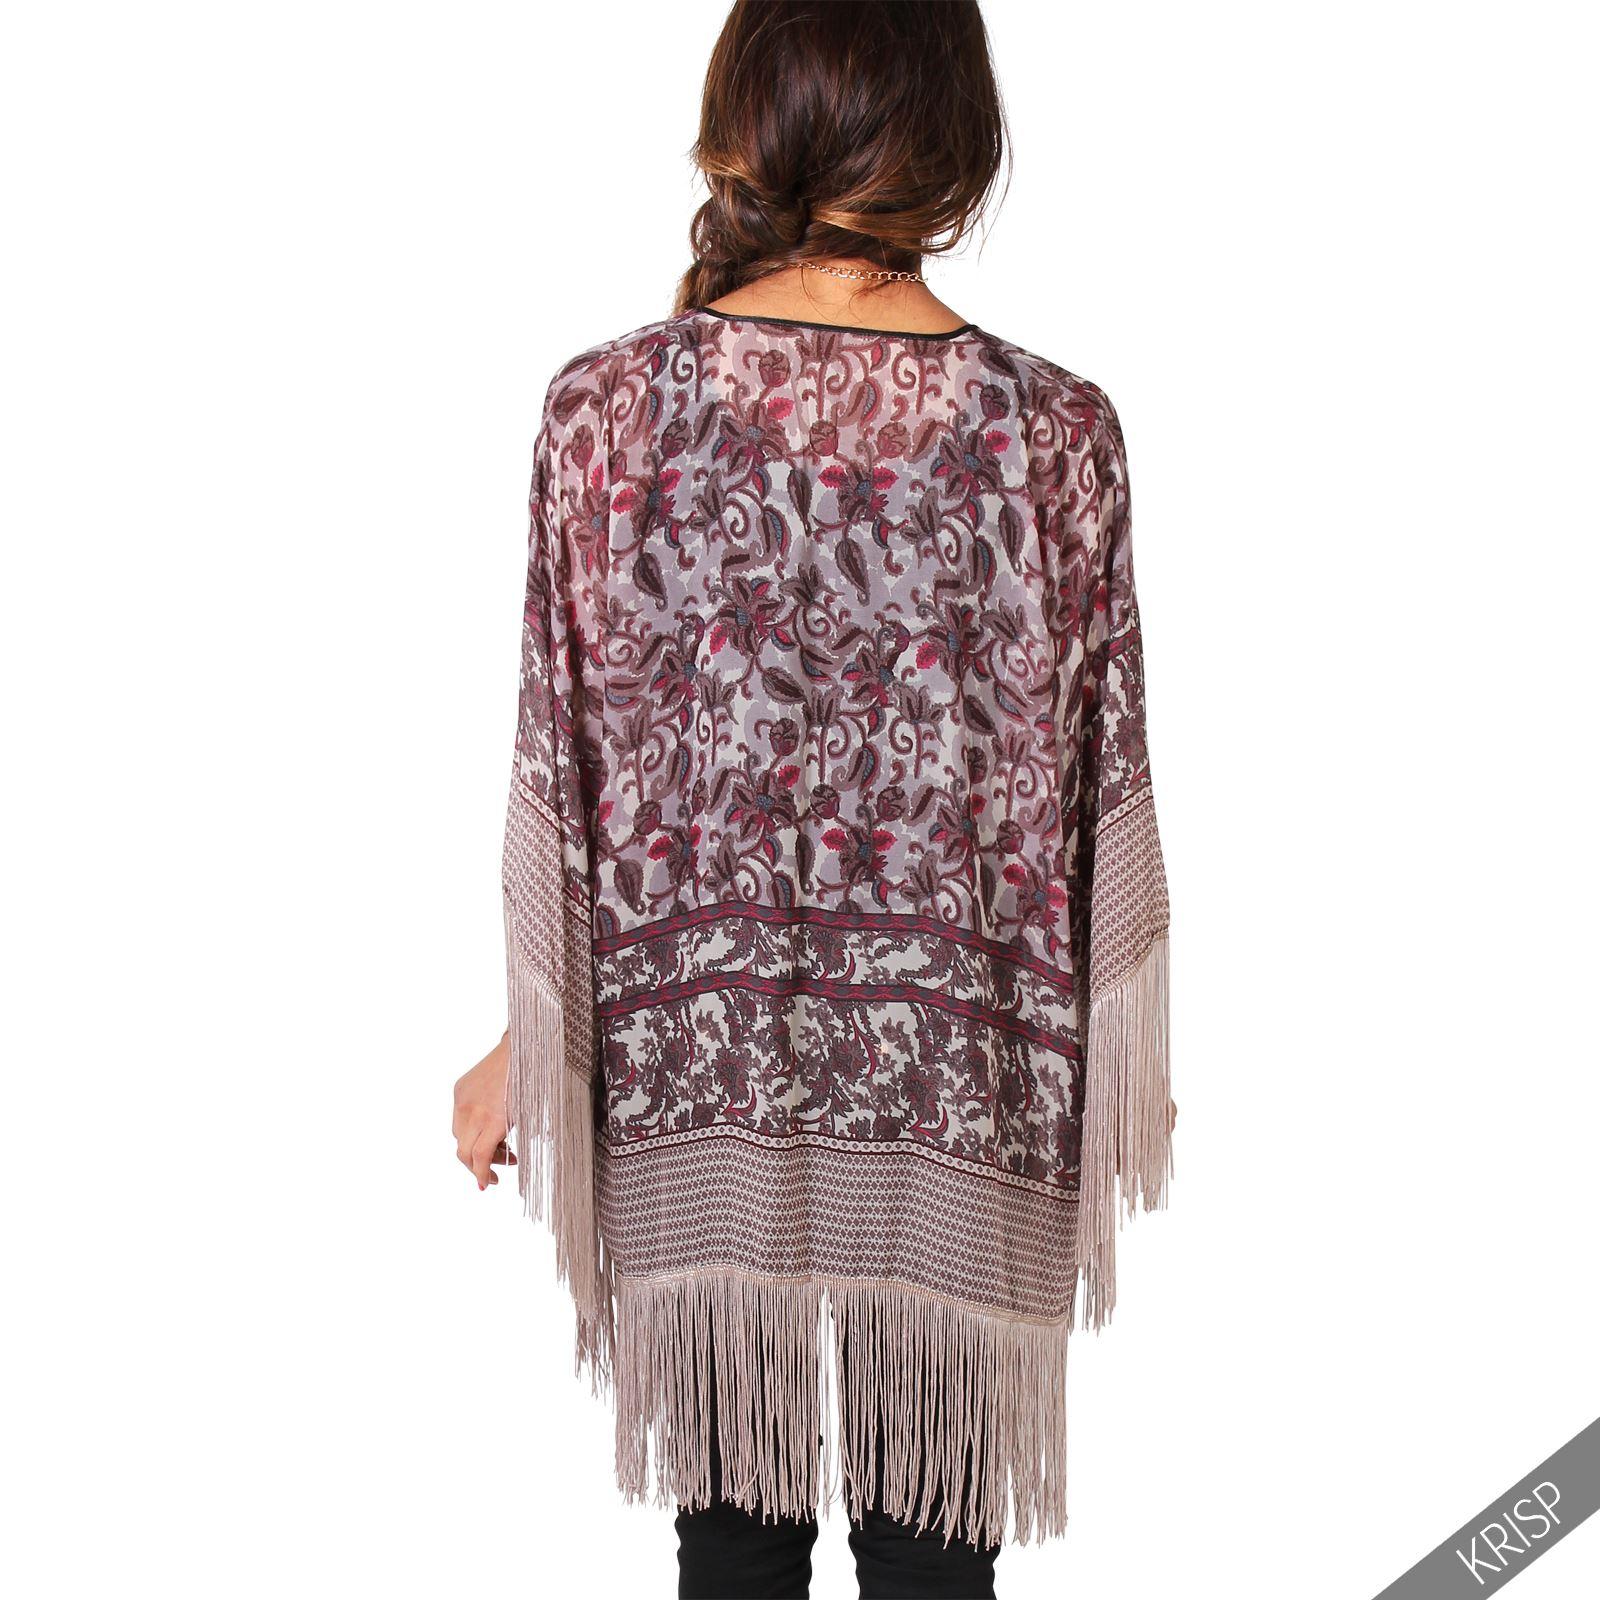 Womens Vintage Boho Tassel Kimono Shrug Beach Cover Blouse